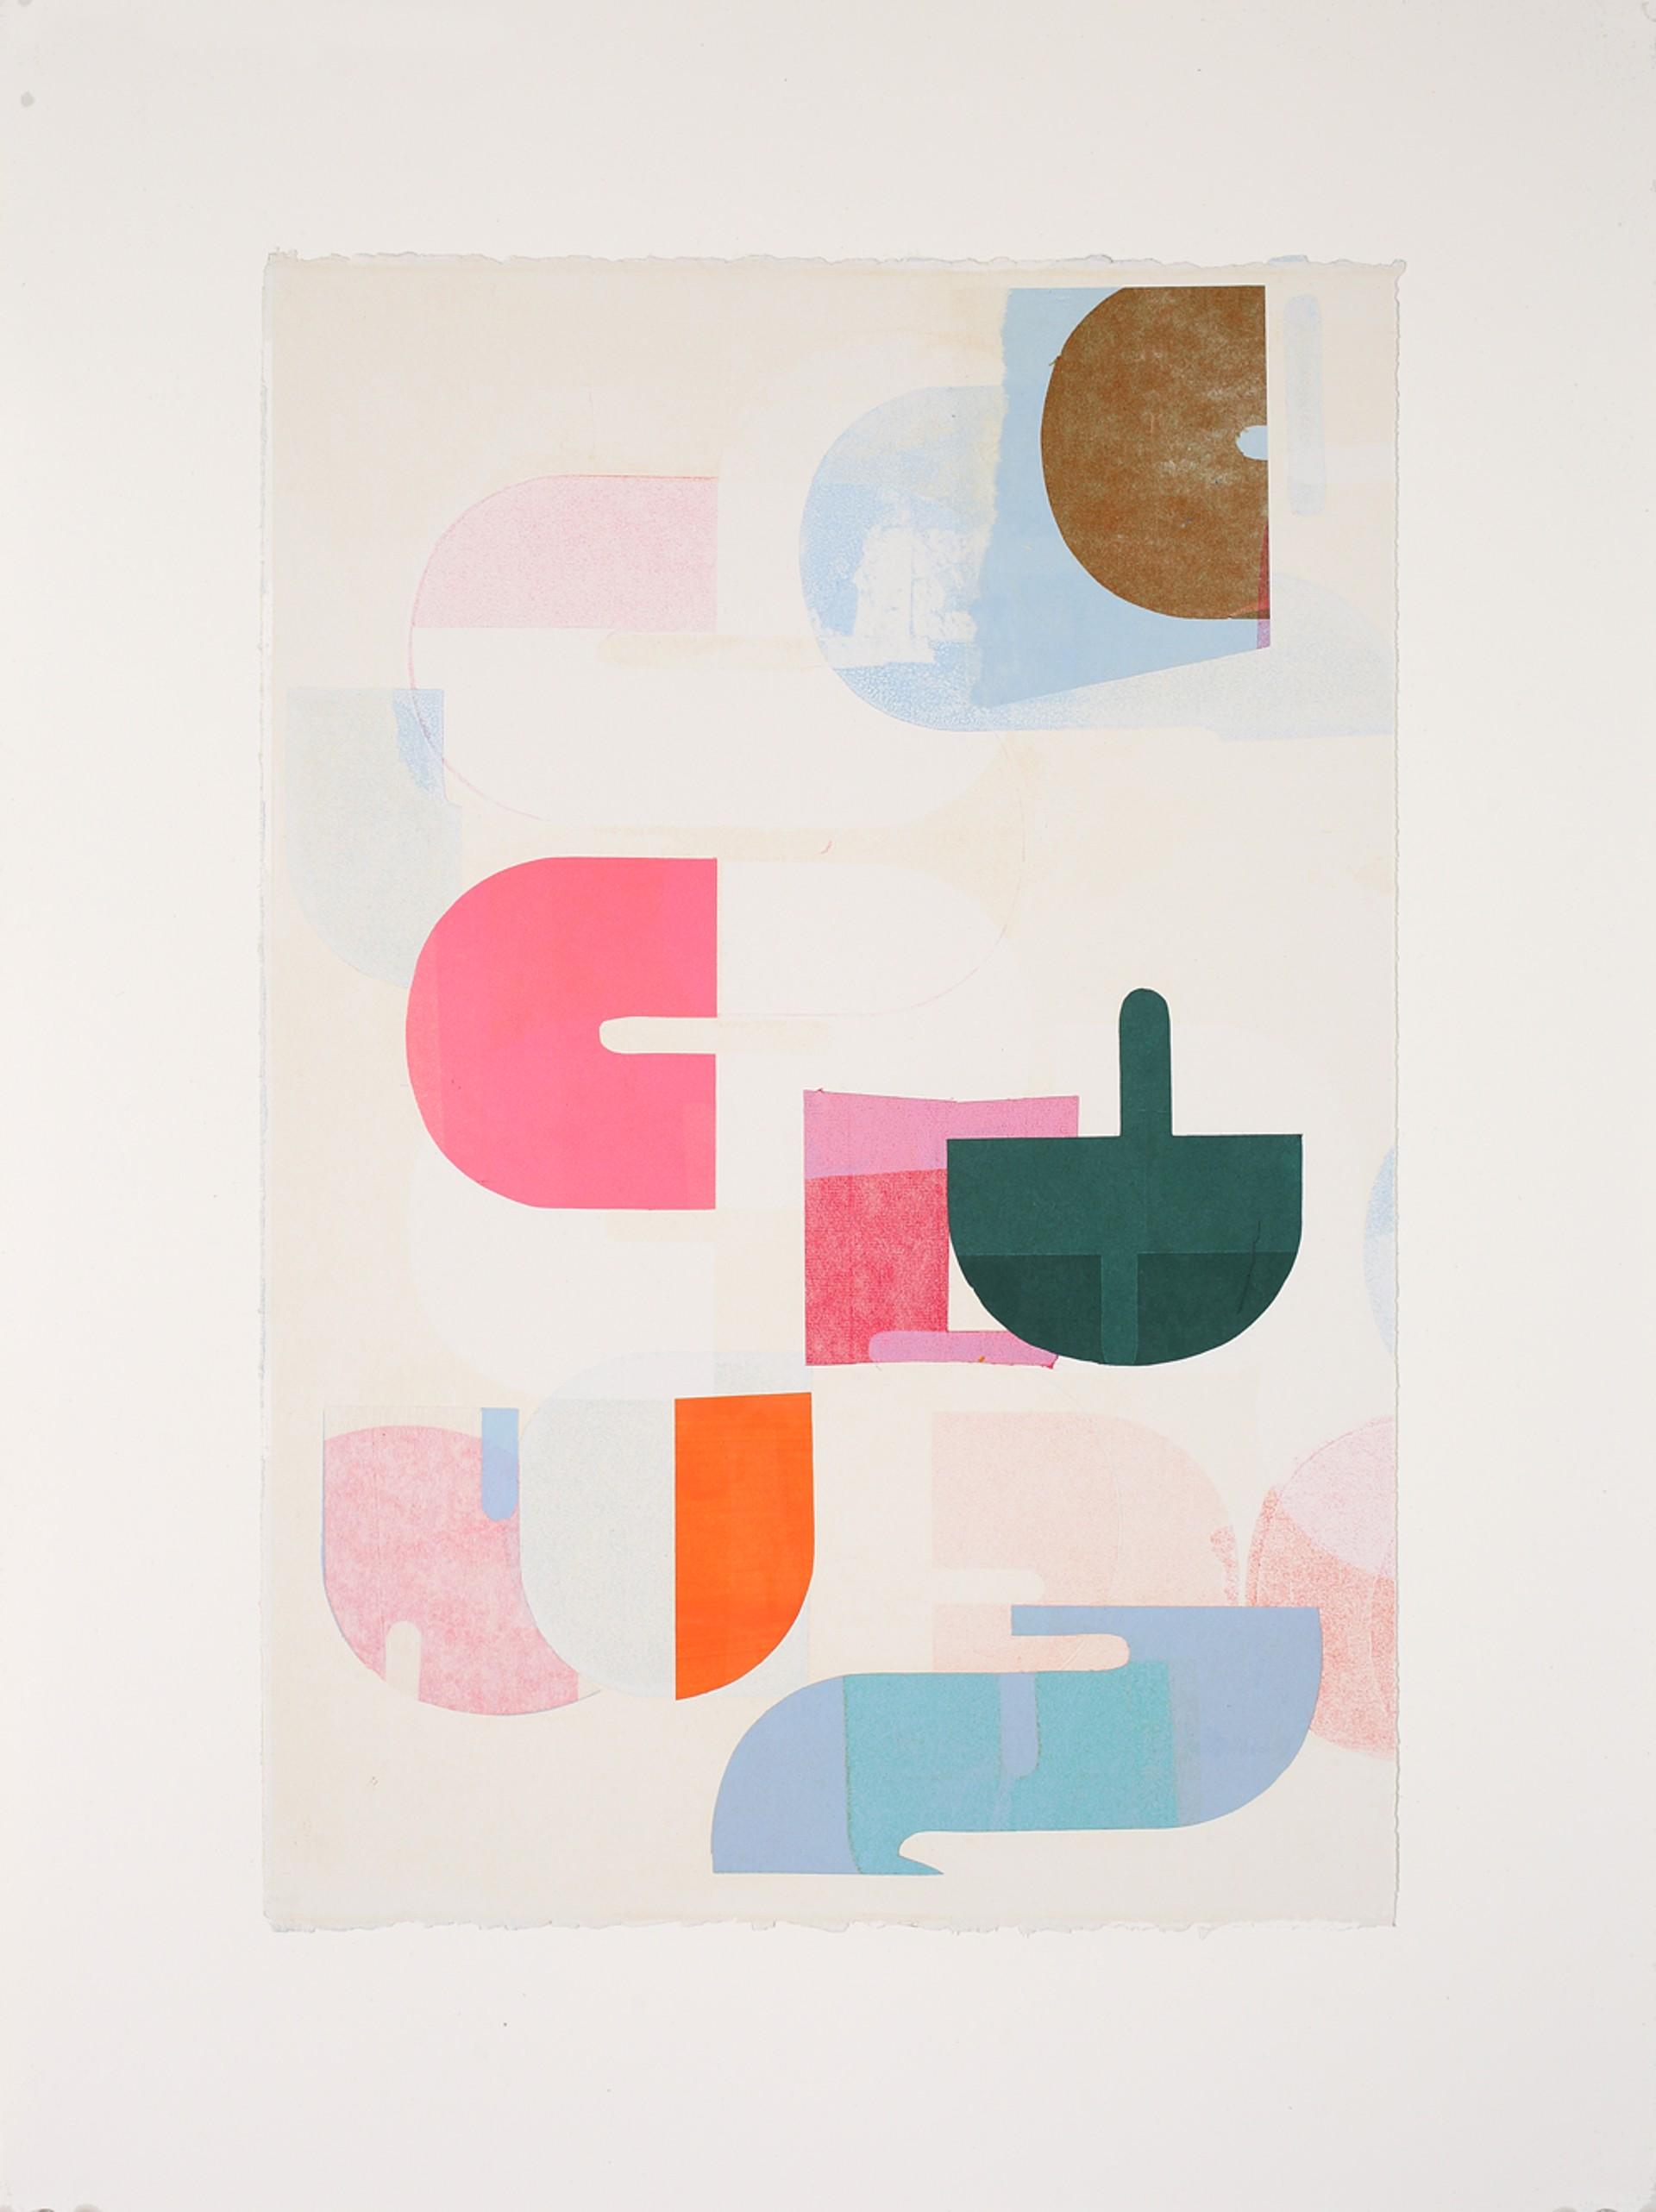 Upright by Lori Glavin